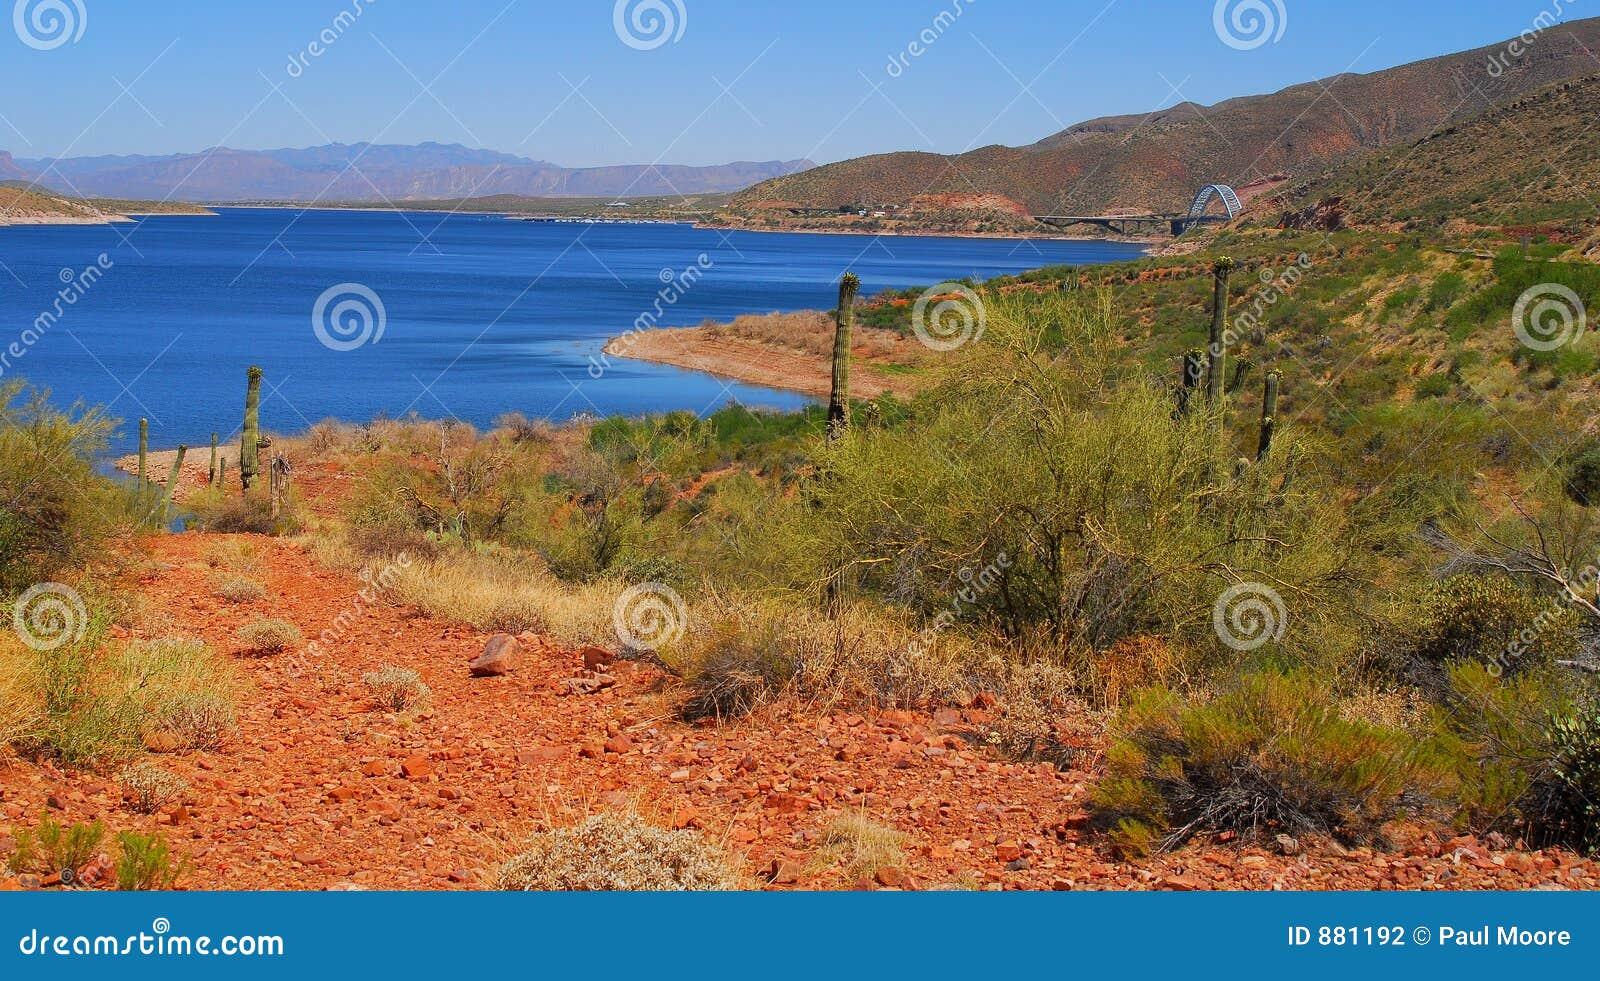 Lake pustyni 2